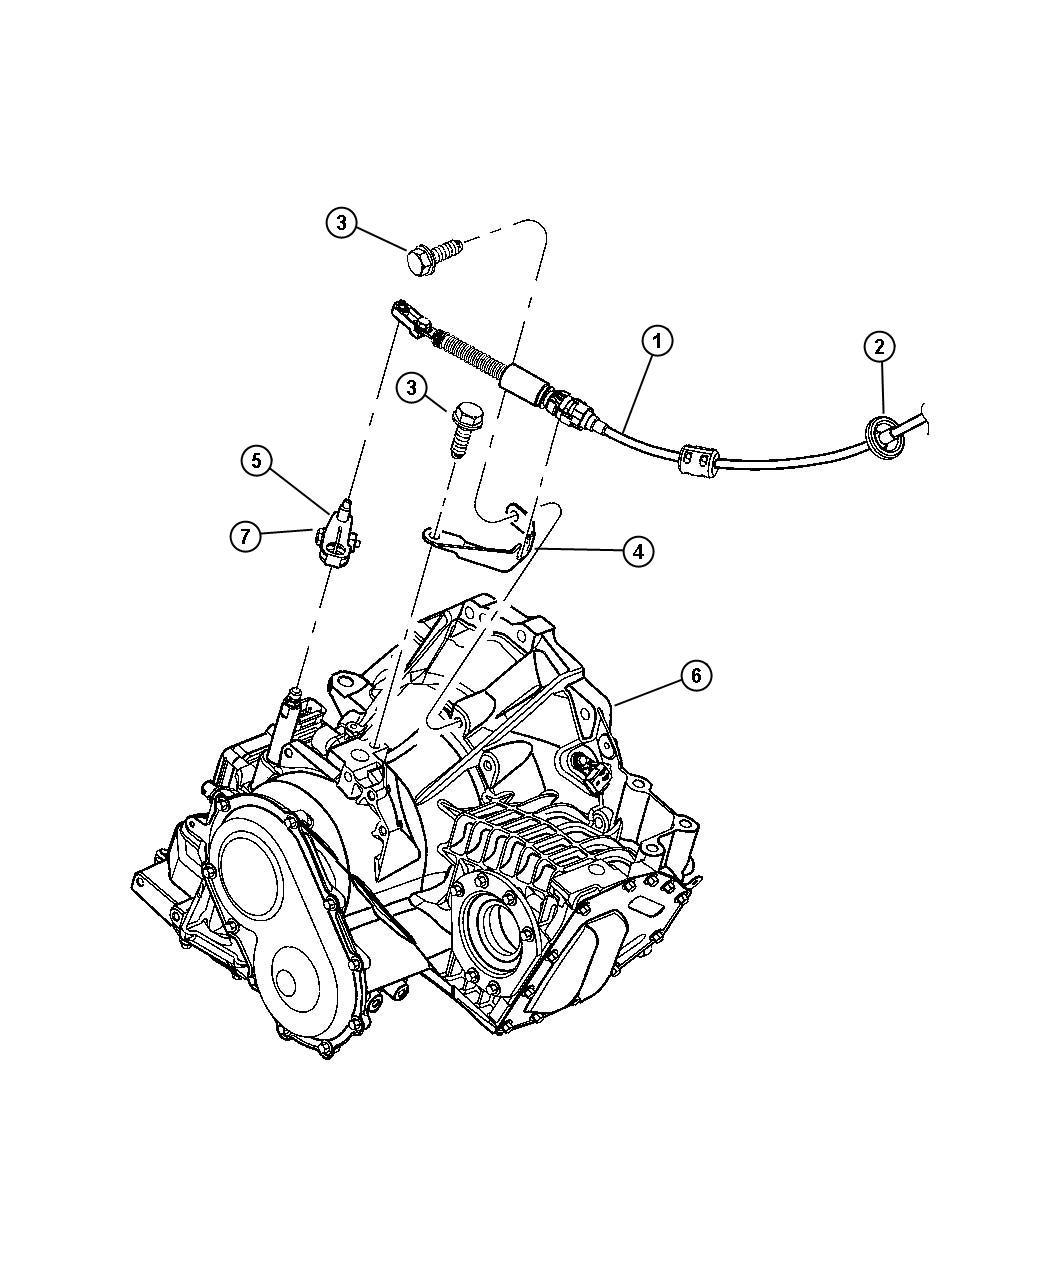 Chrysler Pacifica Trans Pkg With Torque Converter